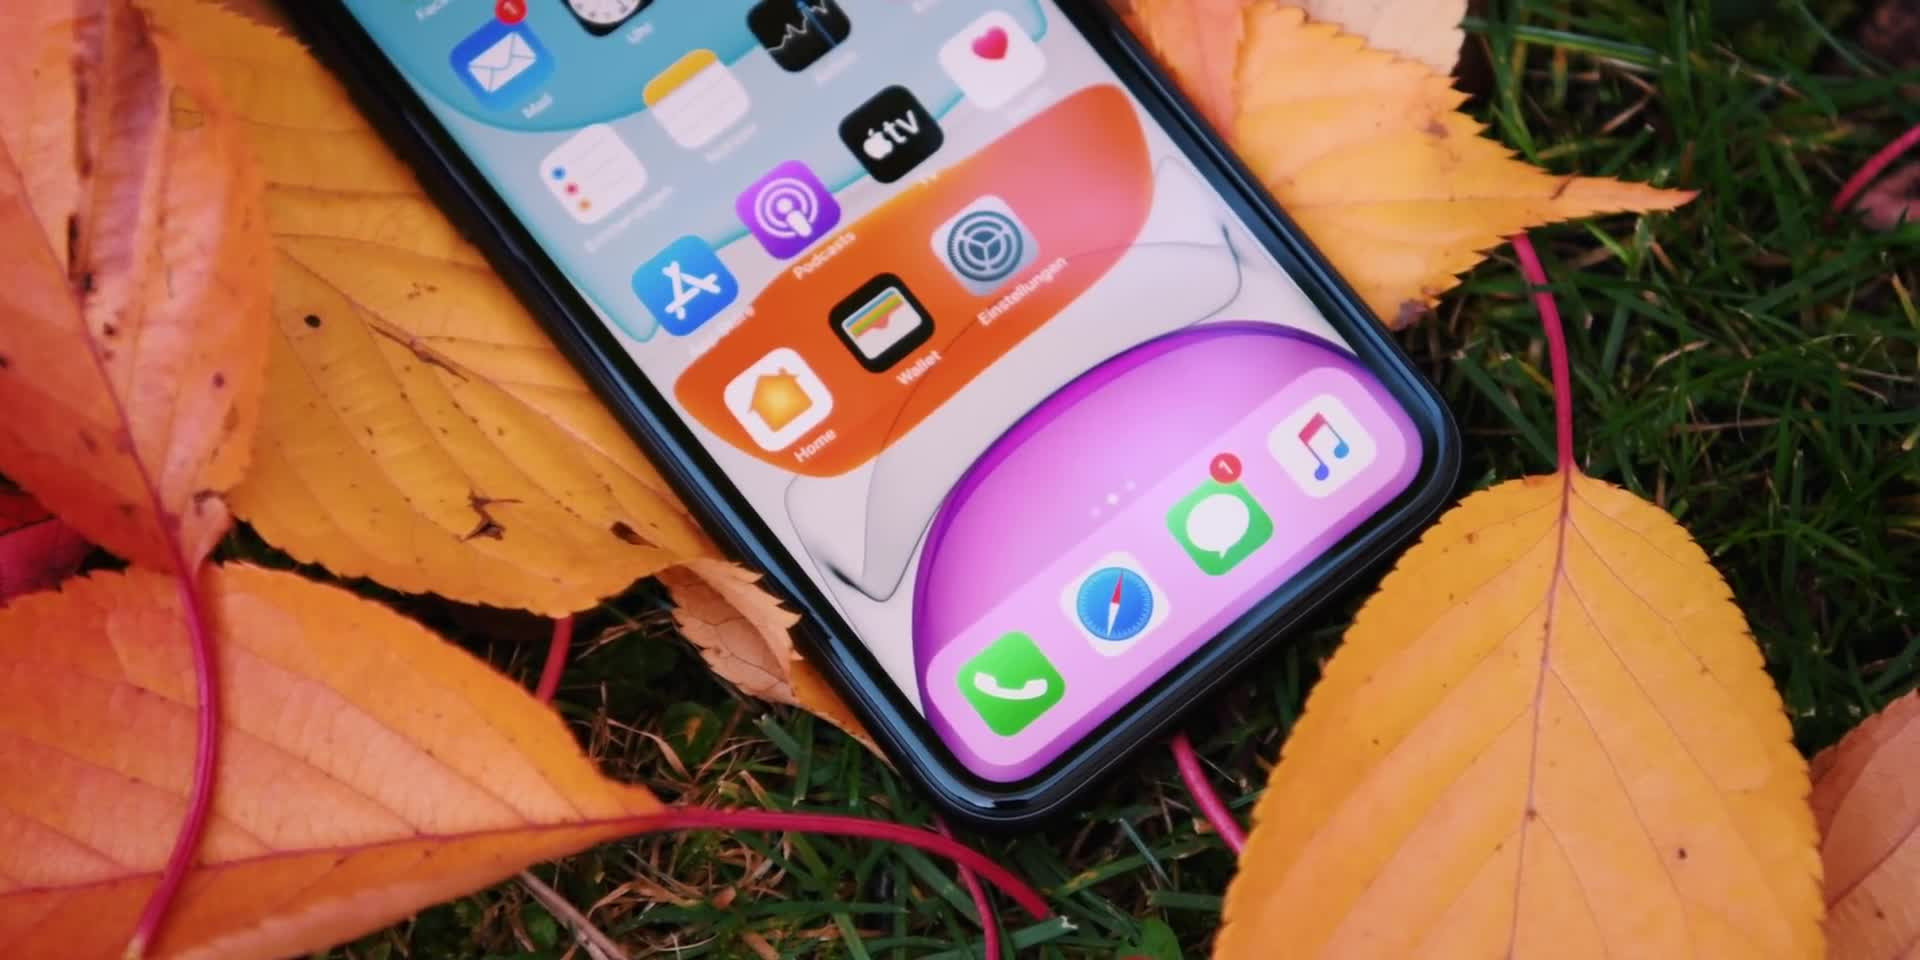 Smartphone, Apple, Test, iPhone X, iPhone 11, Jonas Kaniuth, TechnikFreundYT